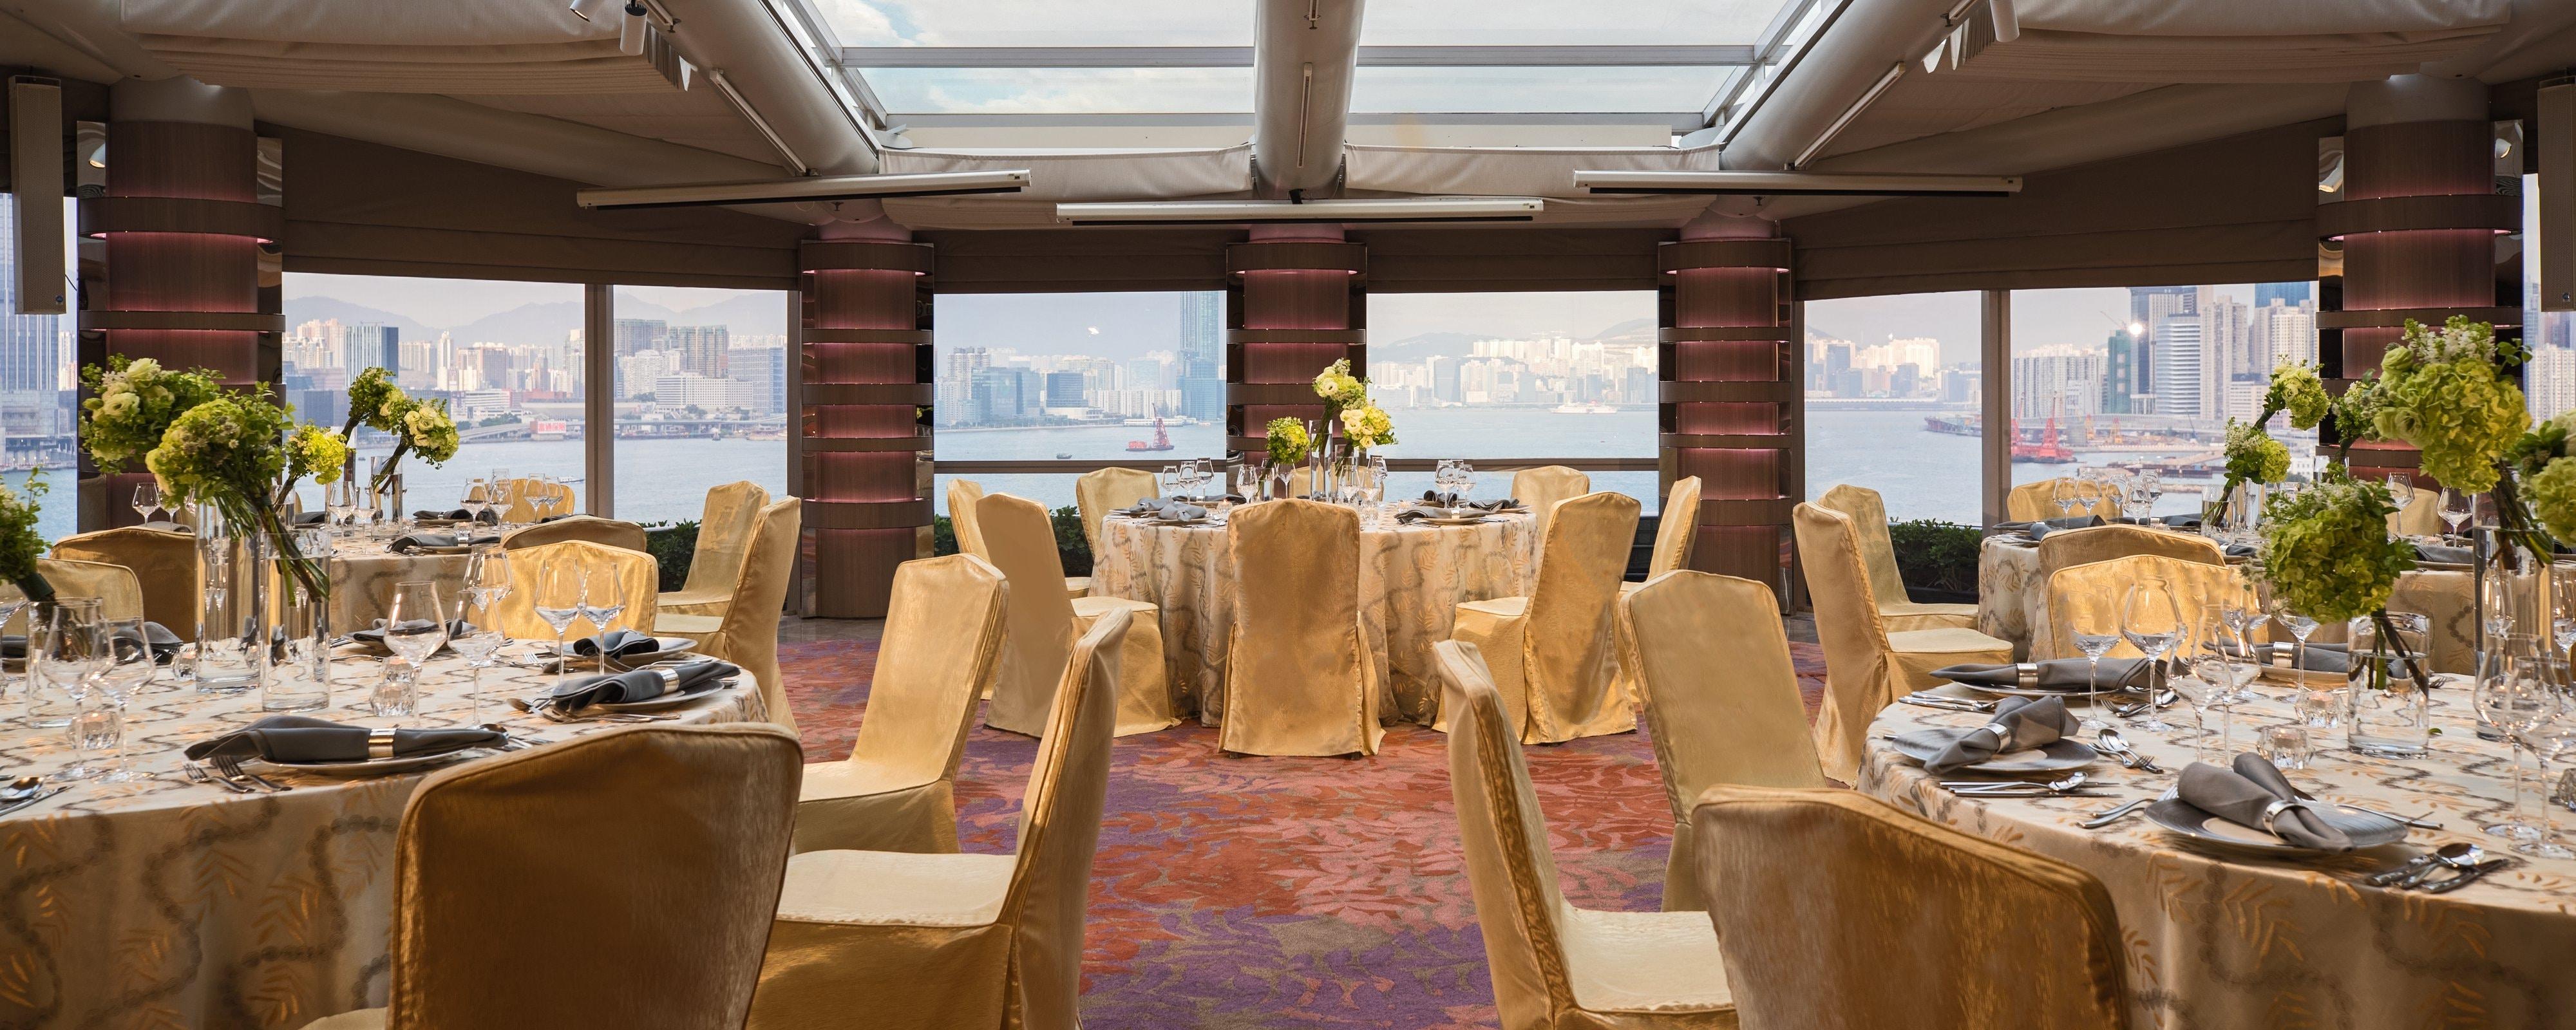 Hong Kong Wedding Reception Venues Renaissance Harbour View Hotel